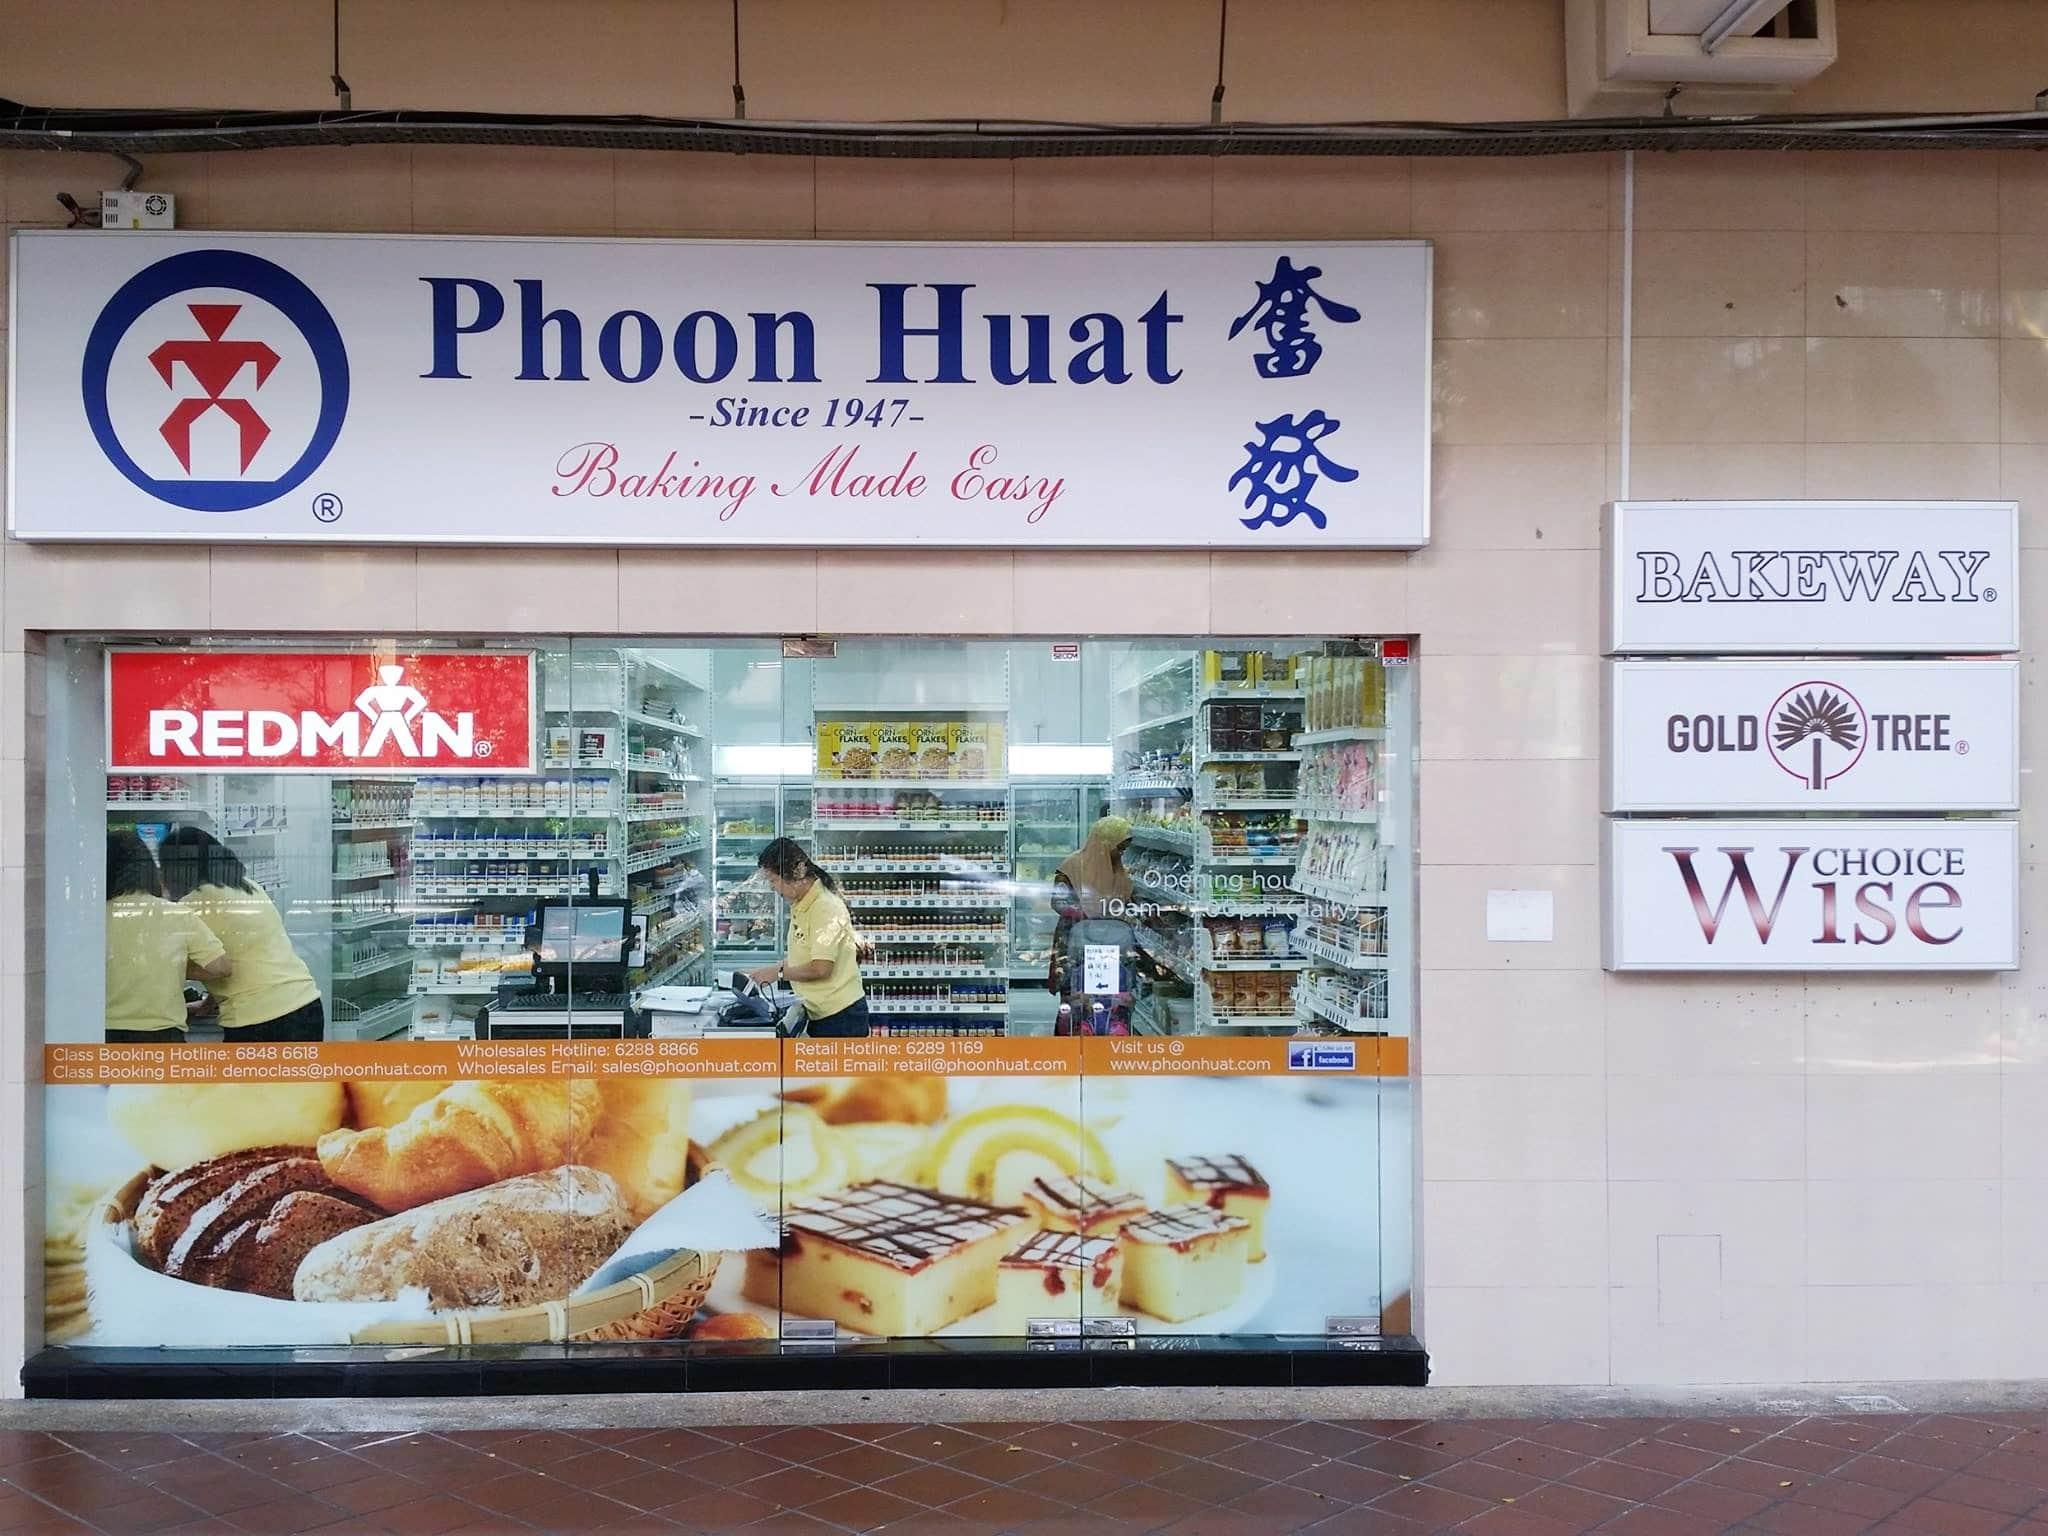 Phoon Huat StaffAny